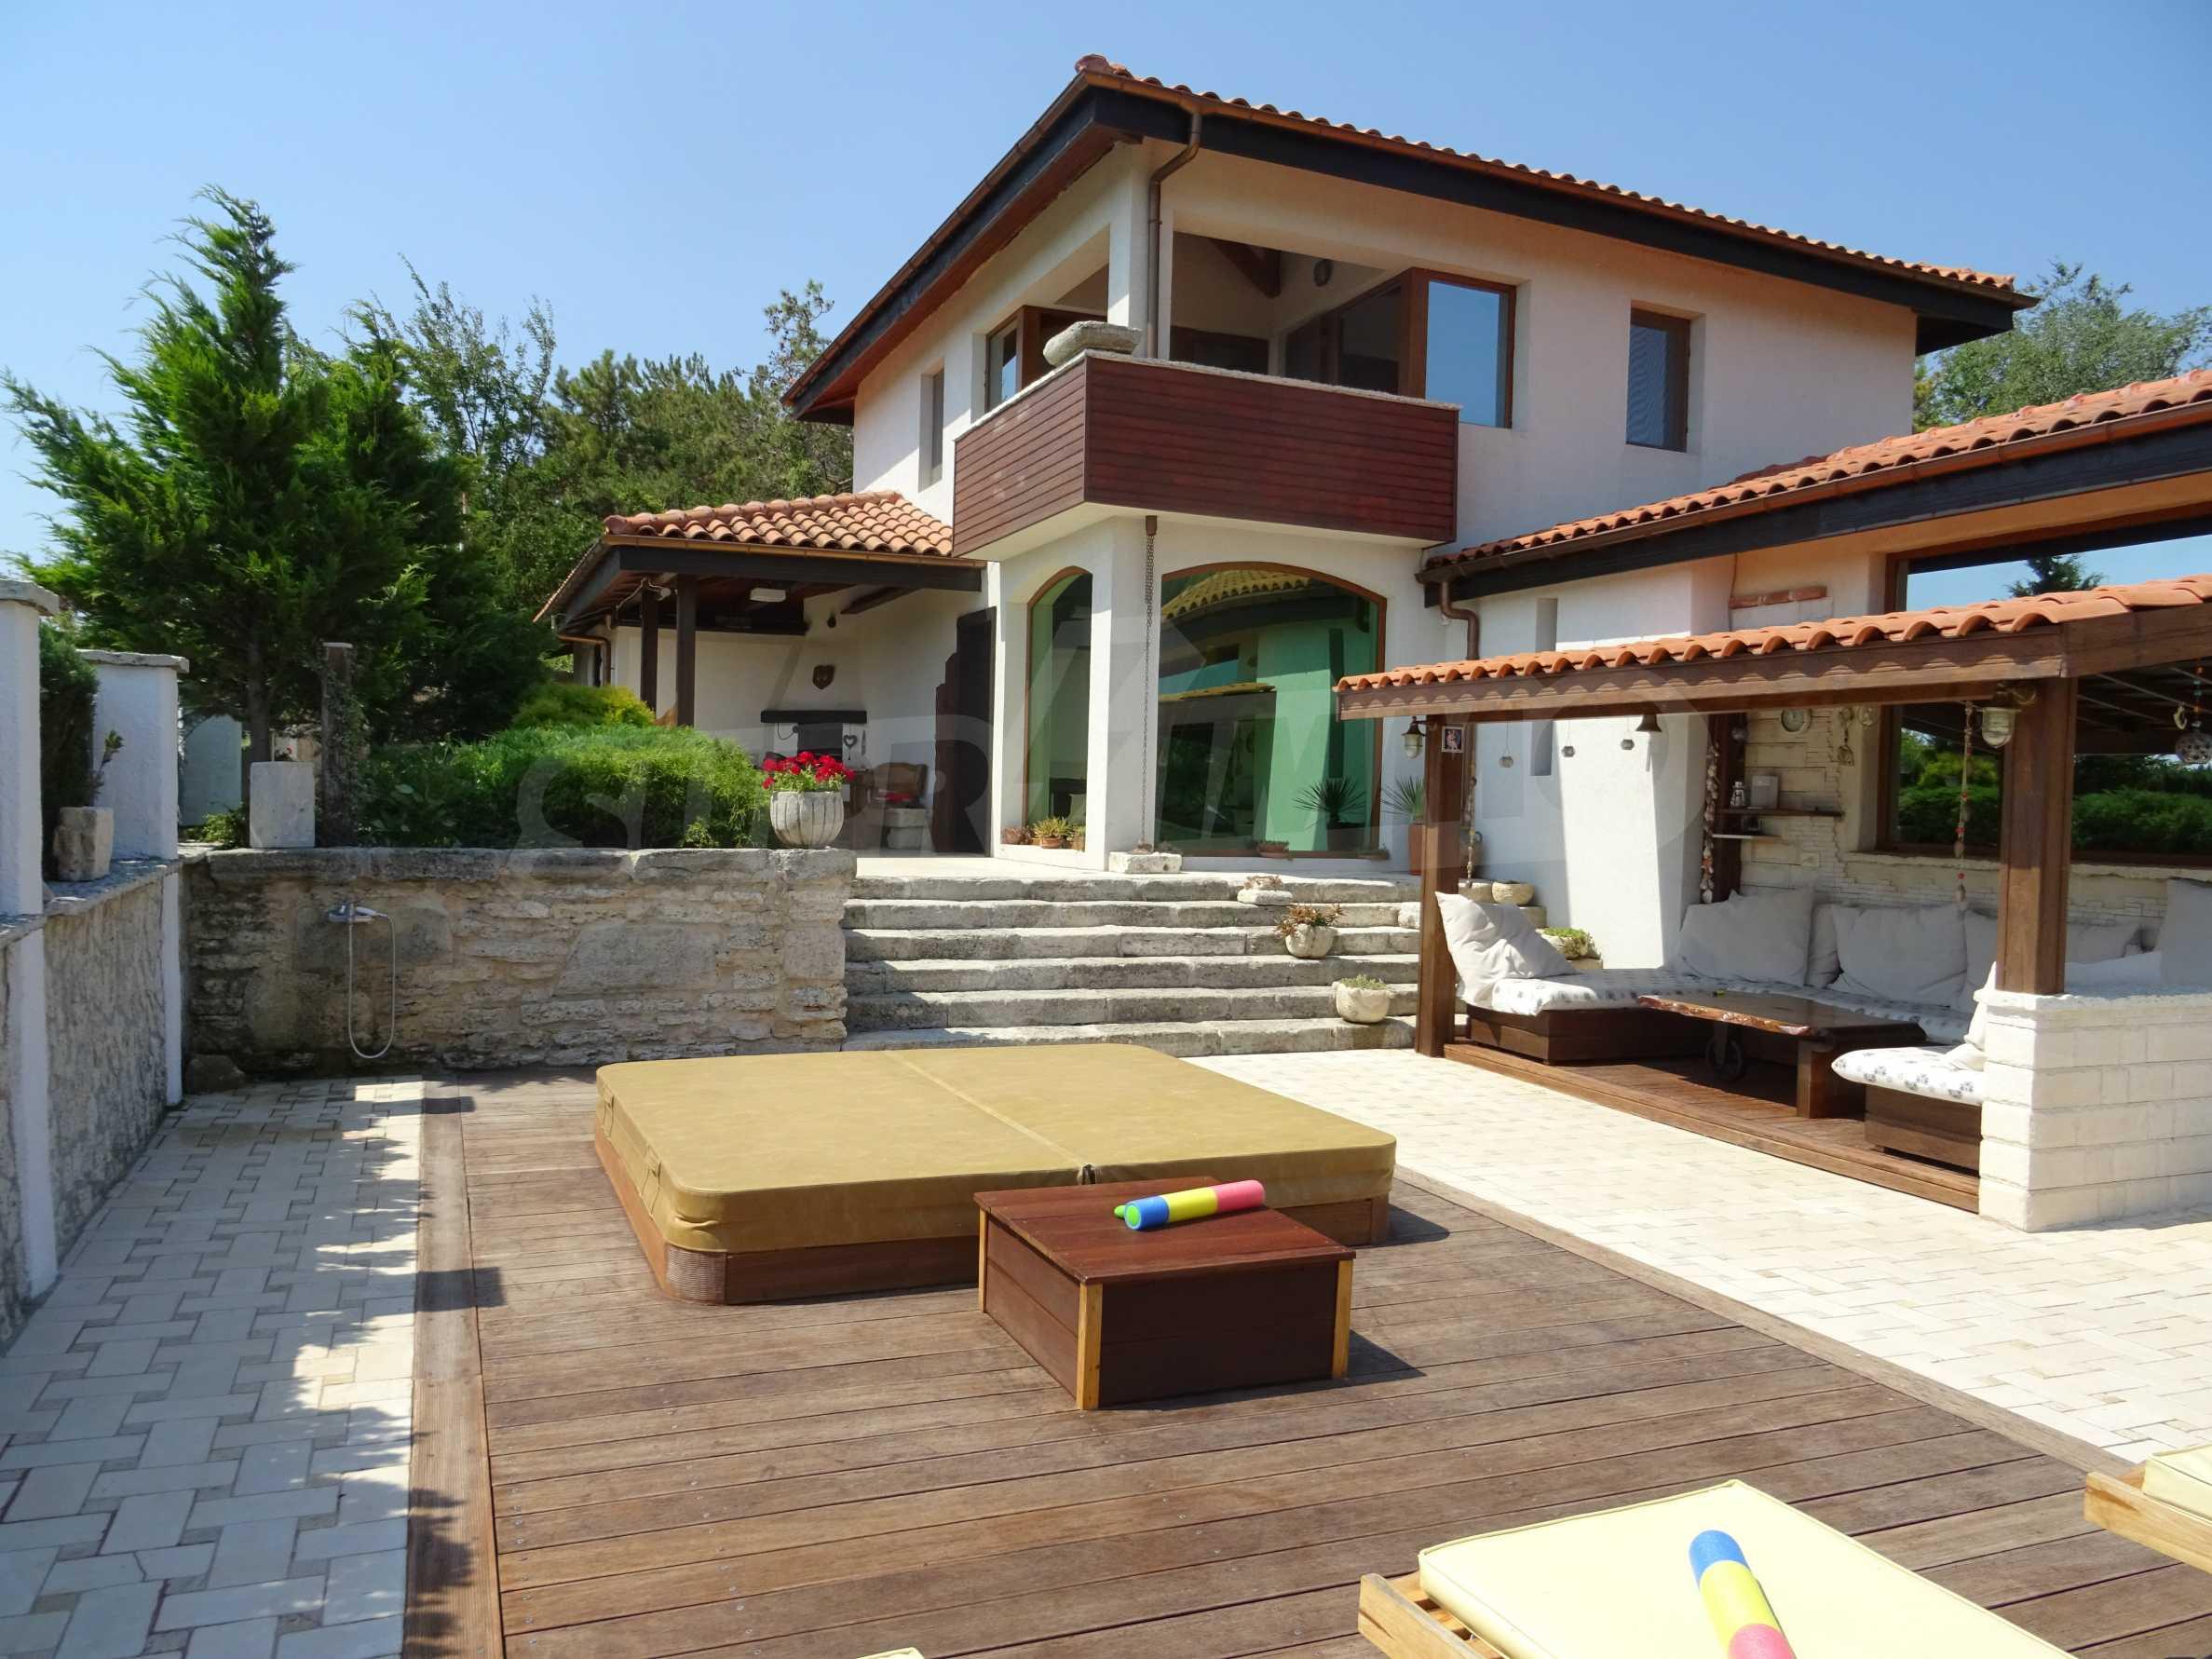 The Mediterranean style - a sense of luxury 9